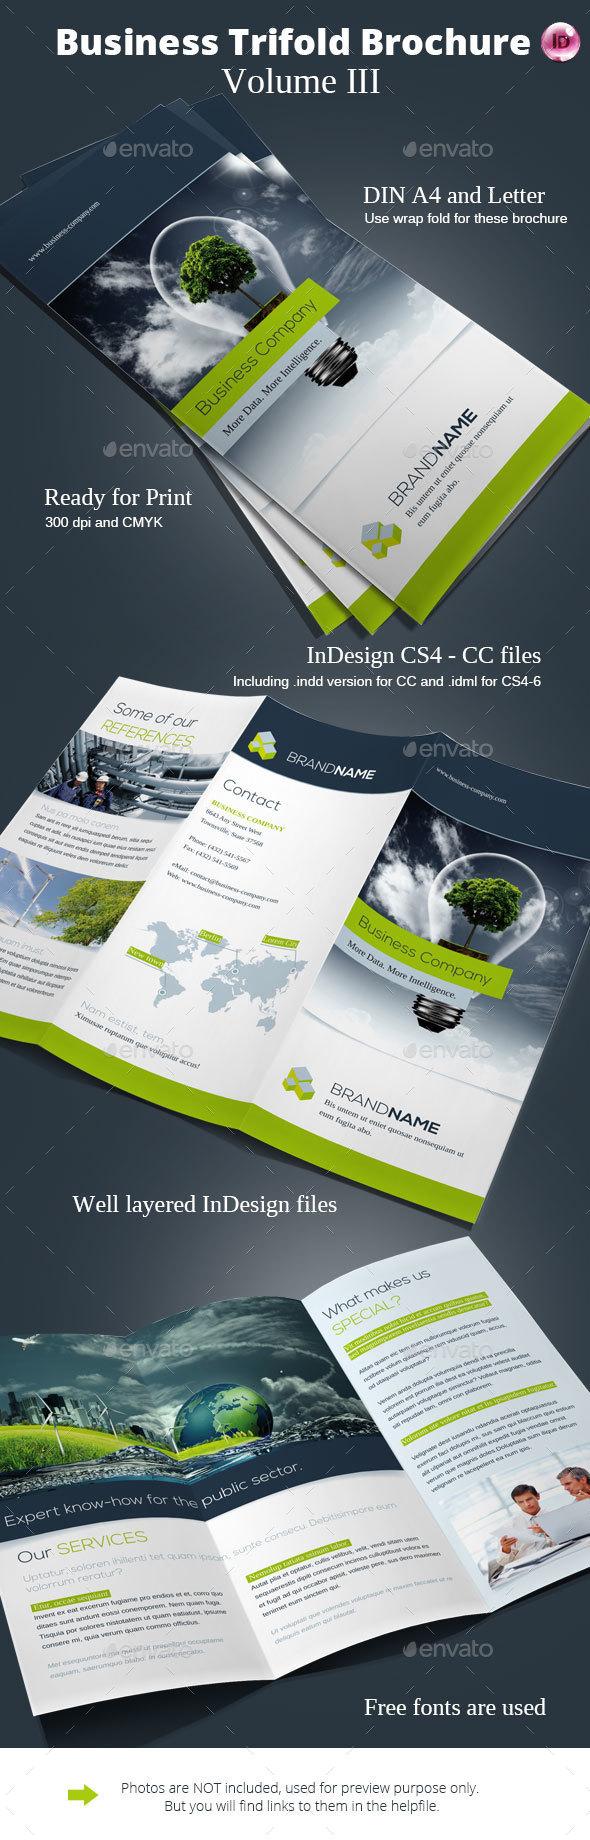 Business Trifold Brochure Vol. III - Corporate Brochures